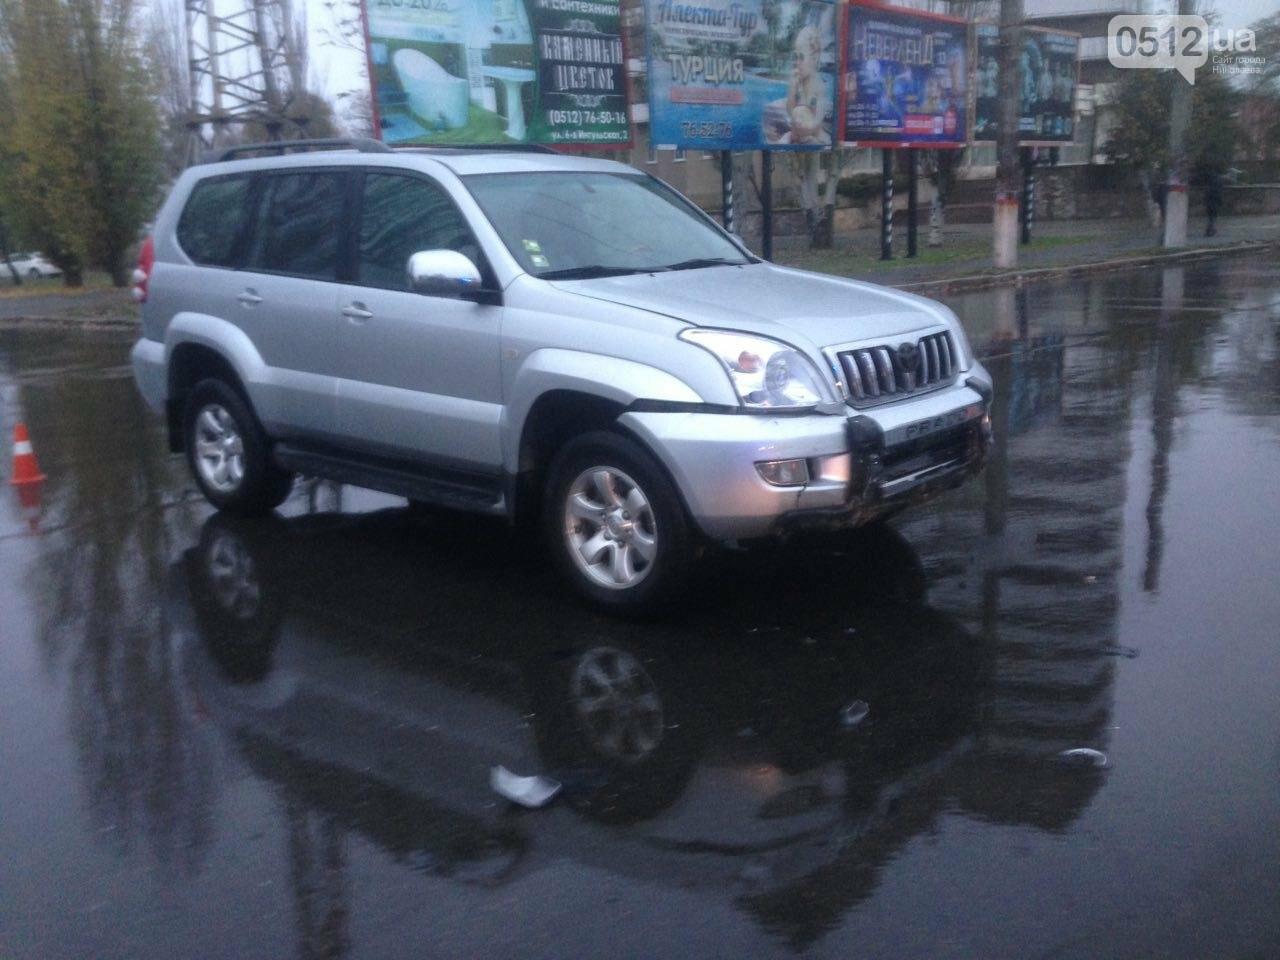 Возле спортшколы Надежда в Николаеве столкнулись Toyota и Subaru, - ФОТО , фото-8